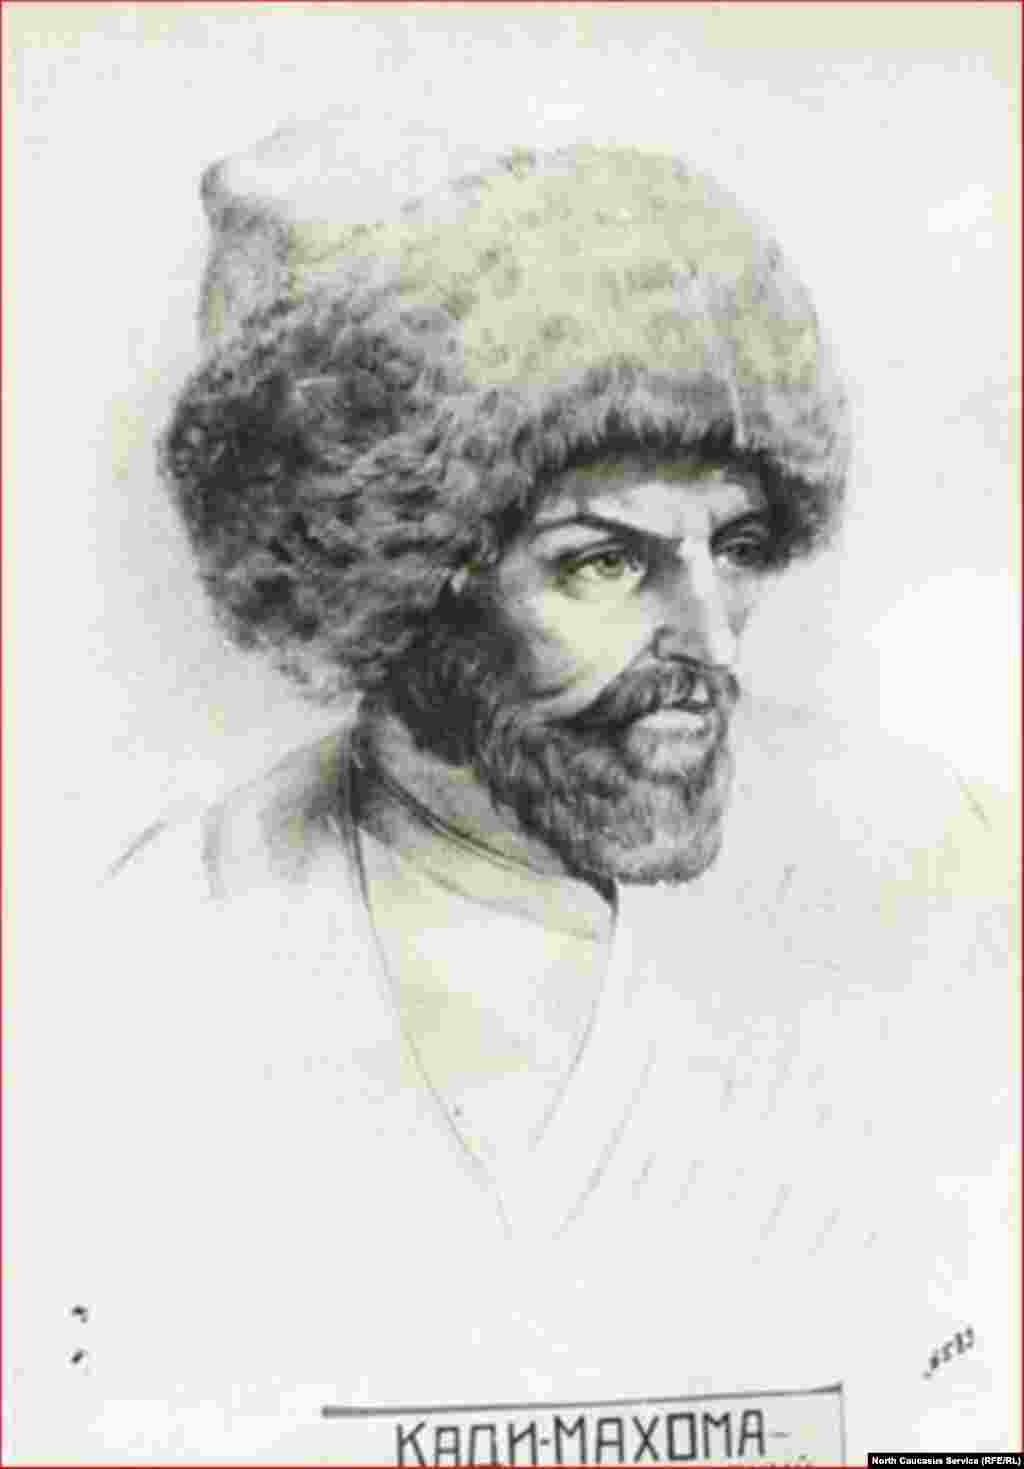 Наиб Кади-Магома-наиб Джаммальский. Богатырев И.С., кон. 1920-х - нач.1930-х гг.